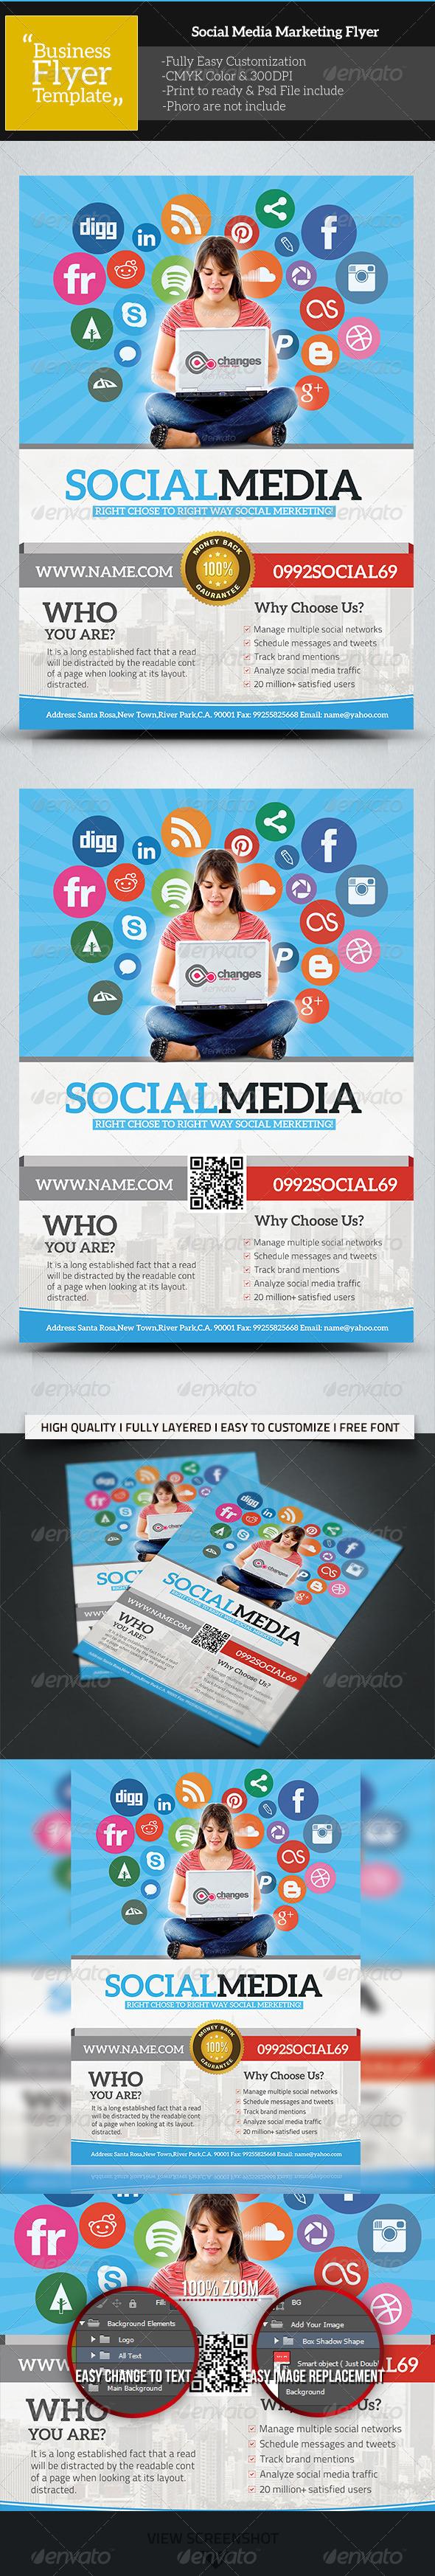 GraphicRiver Social Media Marketing Flyer 5725300